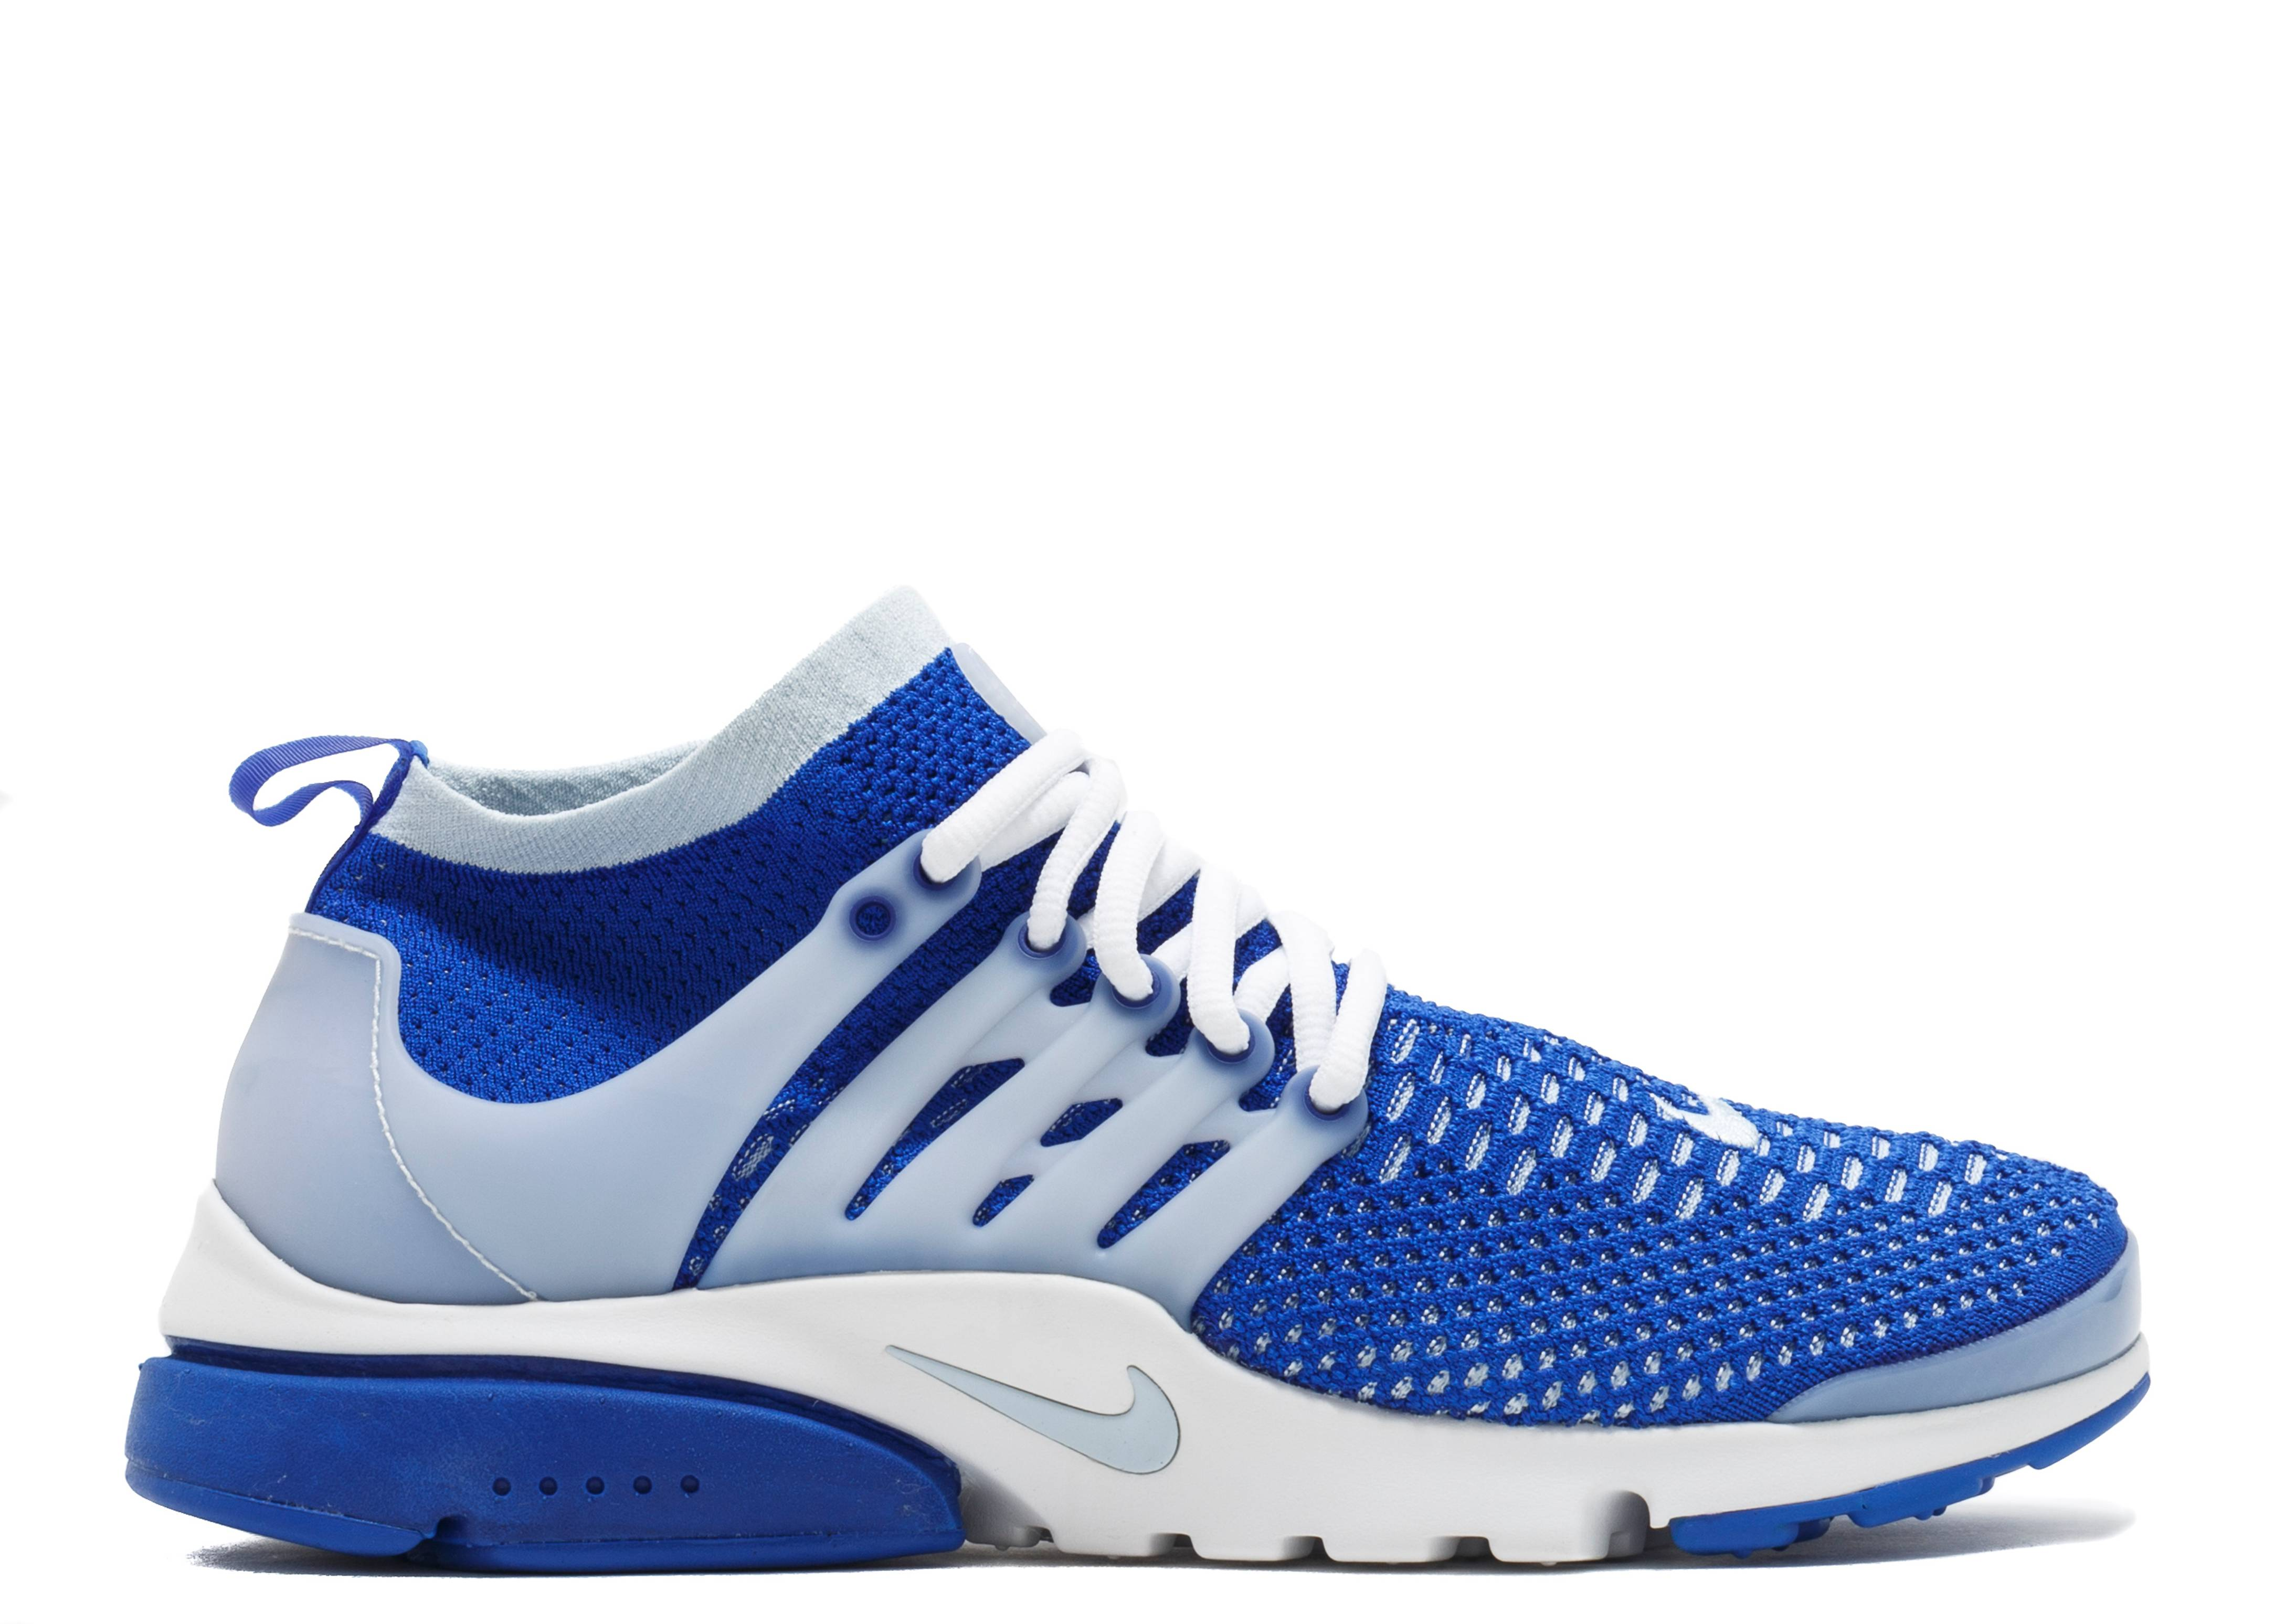 bf0258435f74e Air Presto Flyknit Ultra - Nike - 835570 403 - racer blue bl tint-bl ...